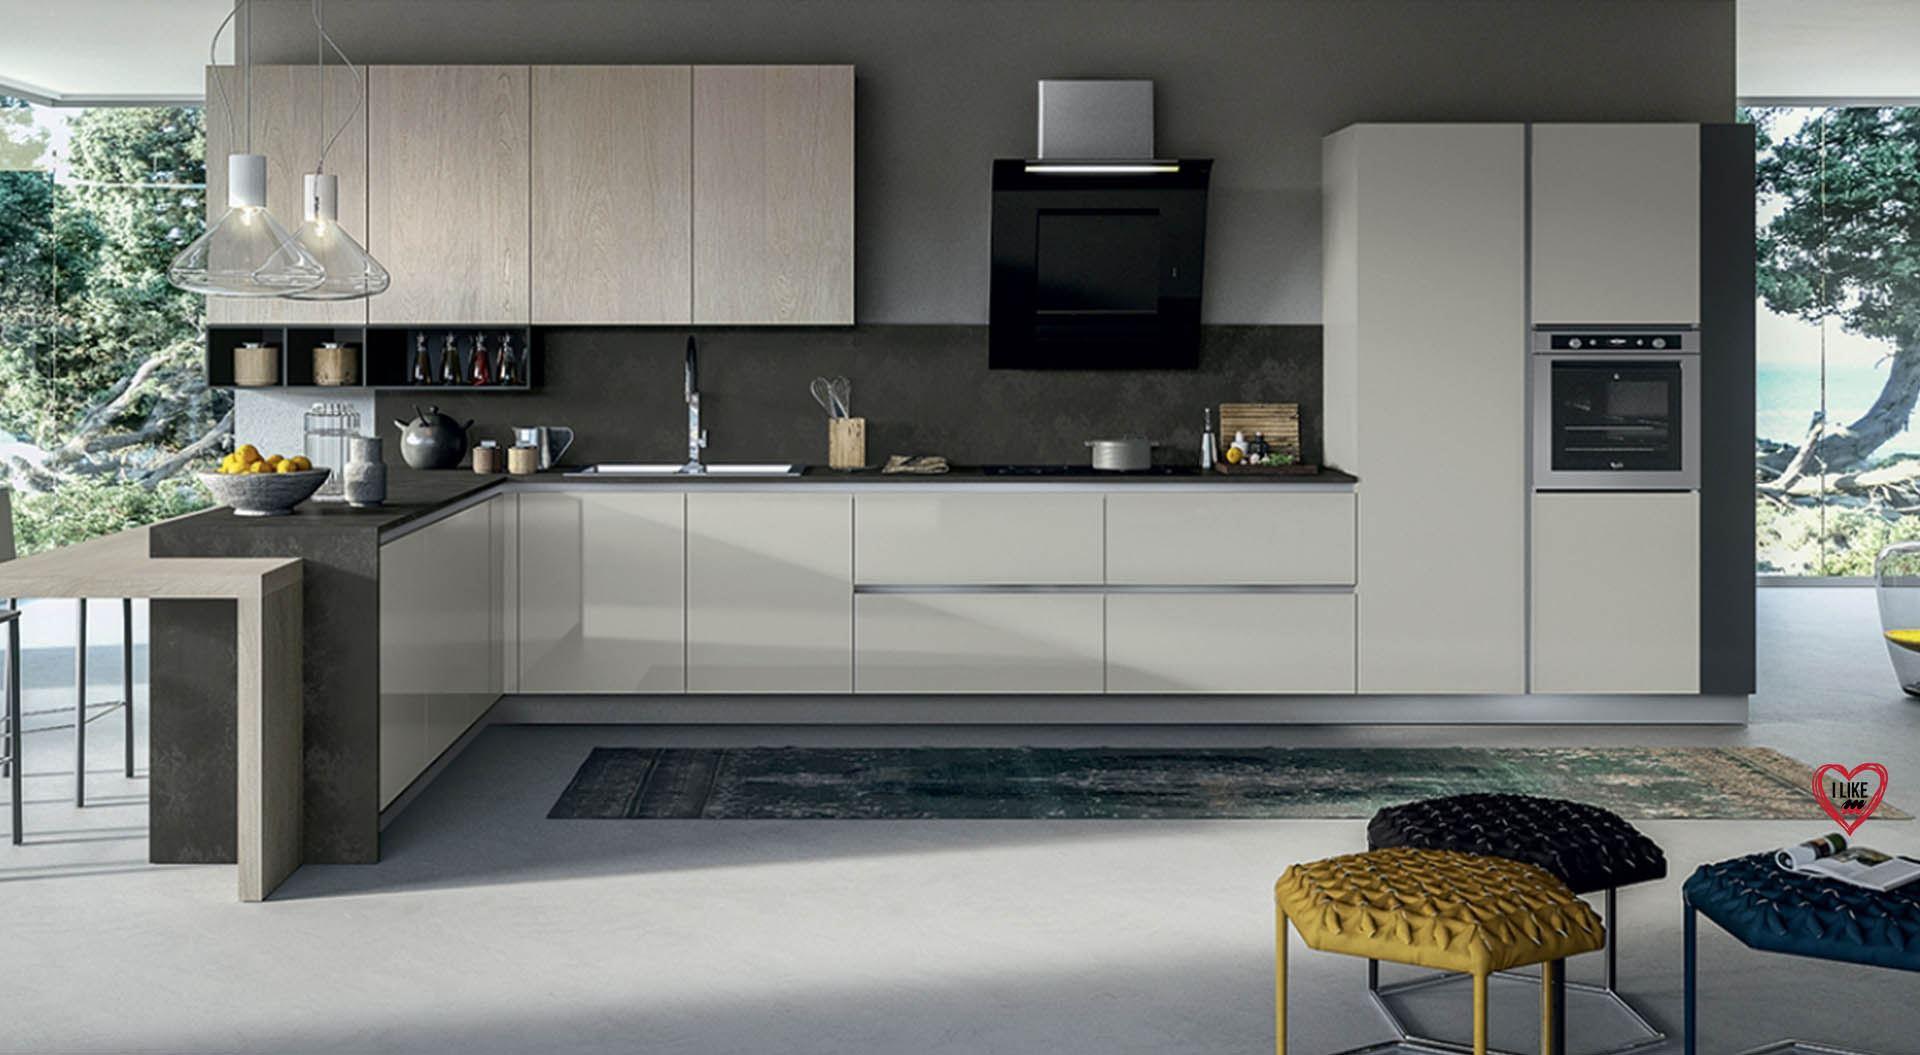 Cucine moderne con penisola padova - Cucine moderne gialle ...